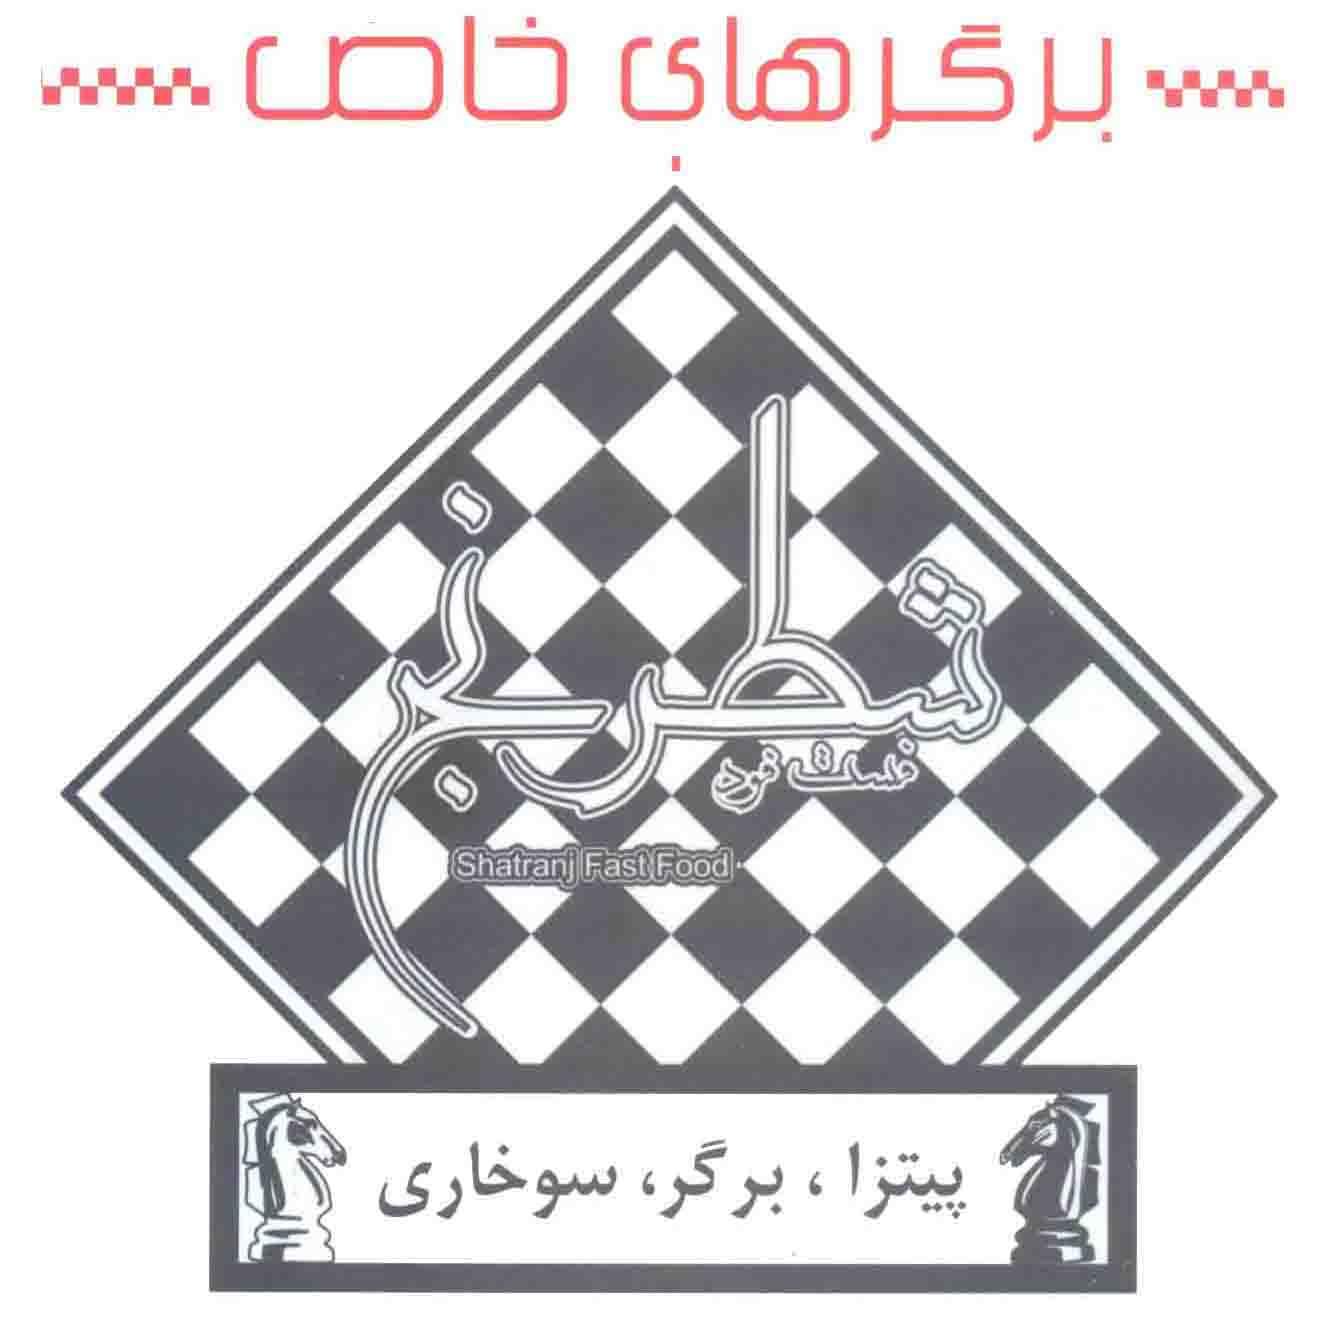 عکس پروفایل پیتزا و همبرگر فست فود شطرنج